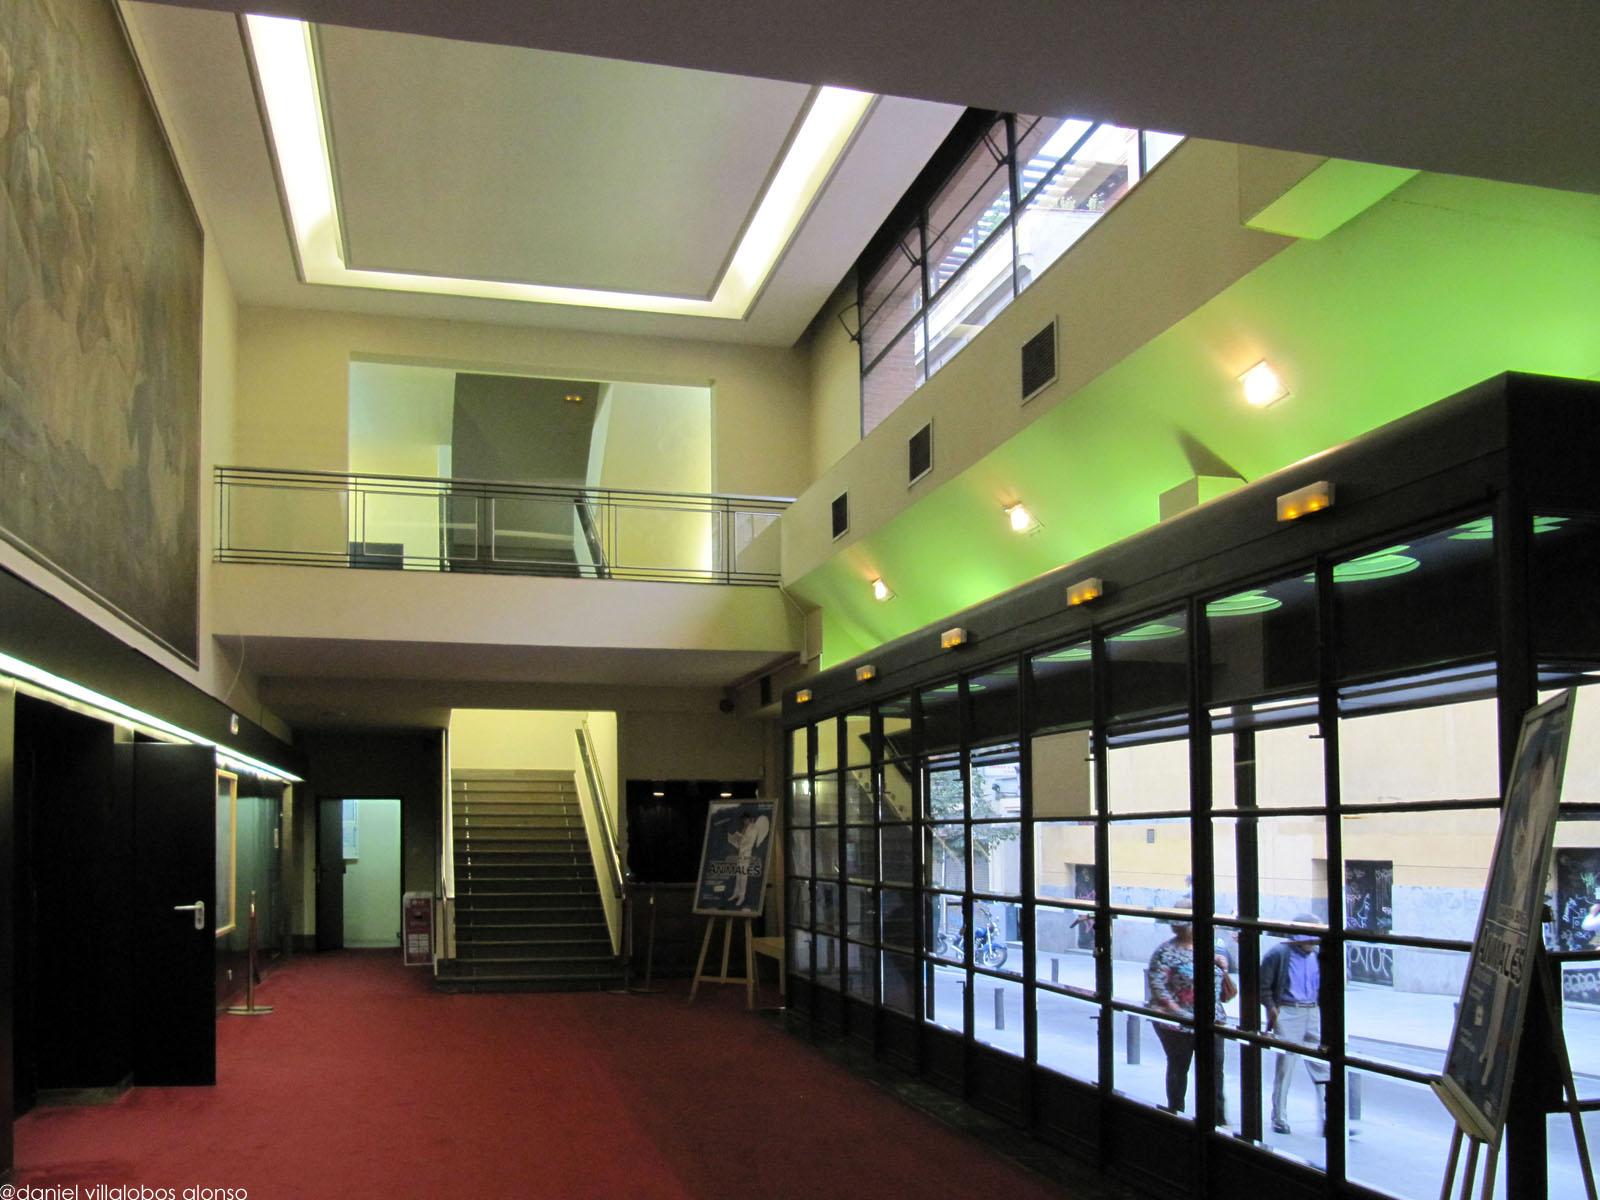 danielvillalobos-cines-digitalphotographies-modernarchitecture-23